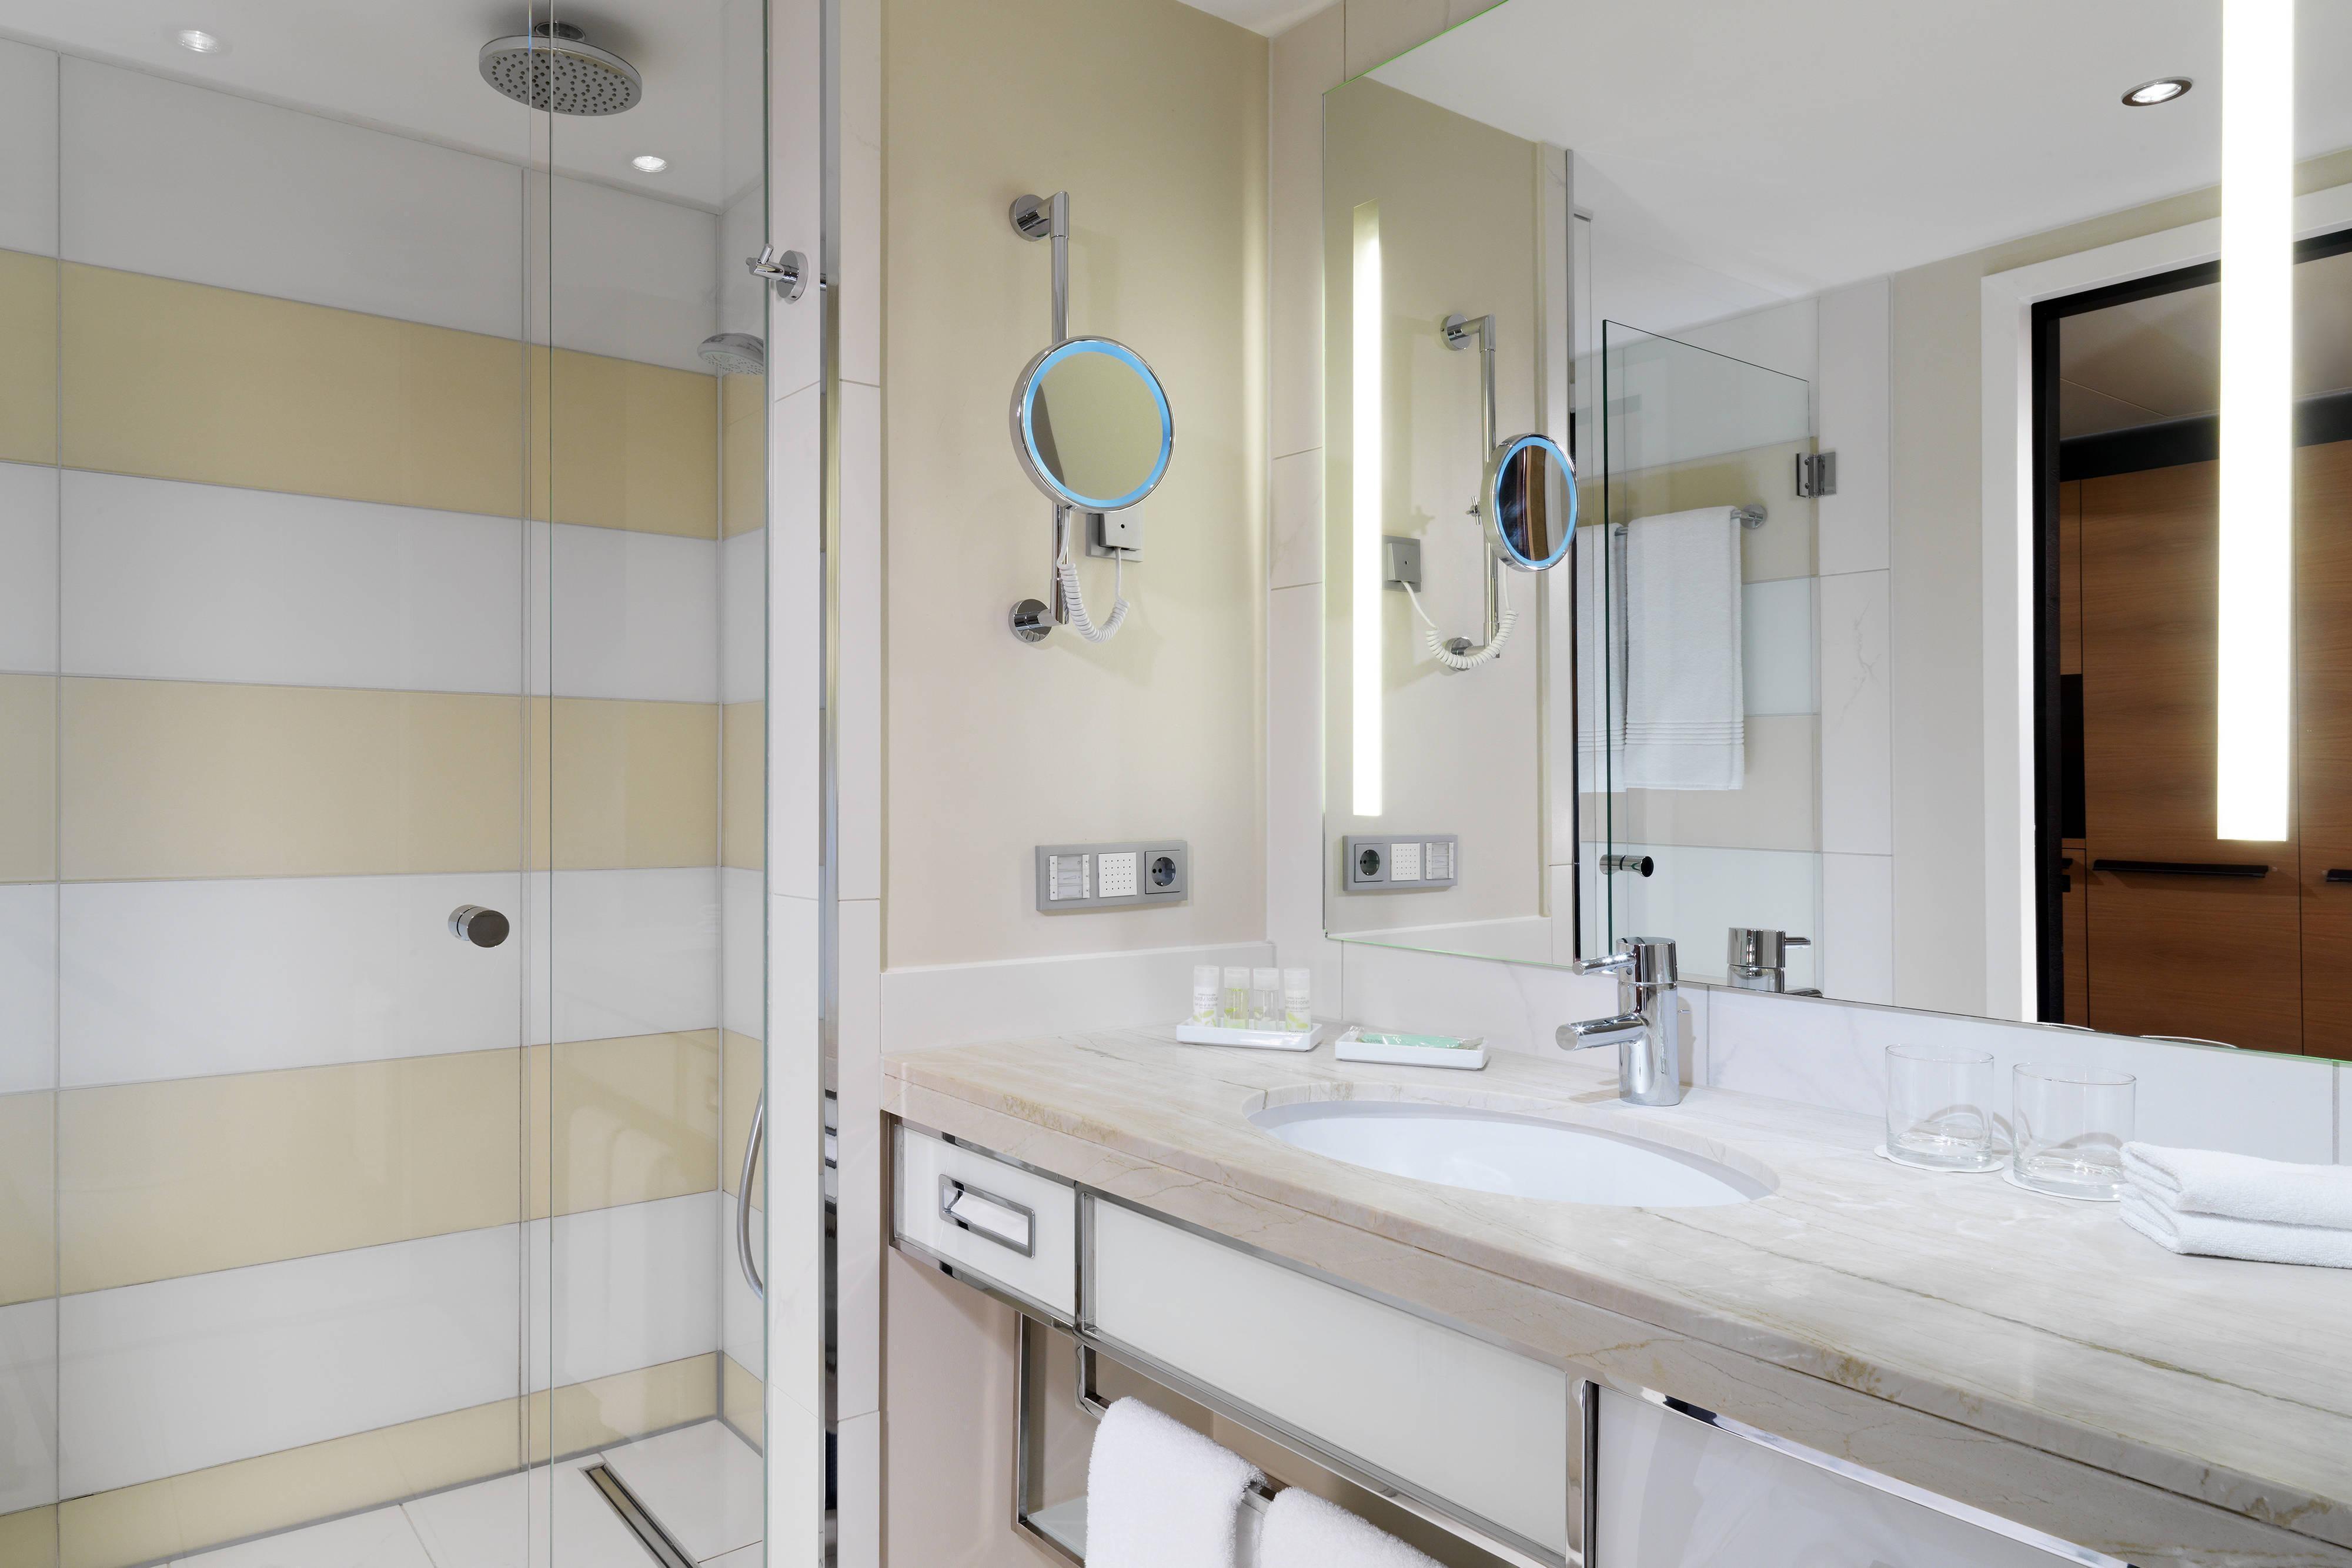 Your accomodation in Berlin Mitte - Linden Superior room bathroom